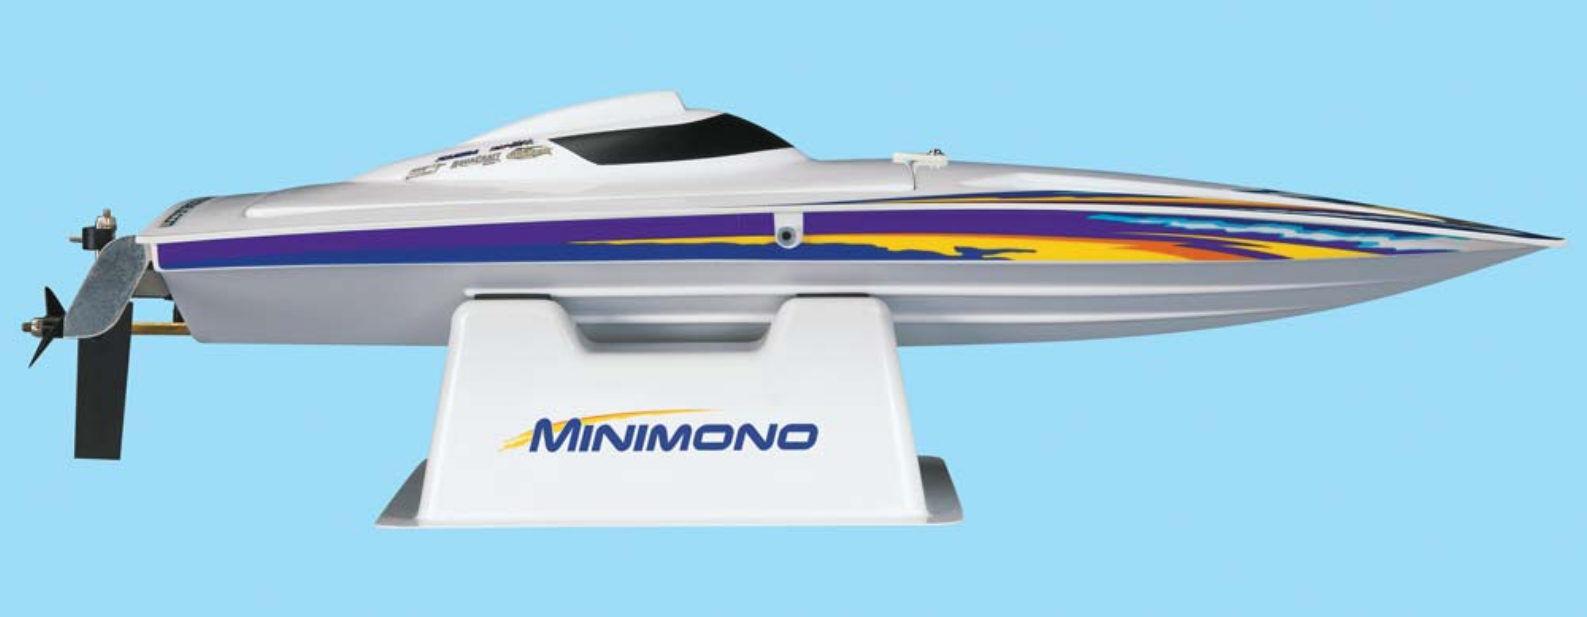 Aquacraft aqub 1806 lancha rápida mini mono rtr longitud total 458 mm